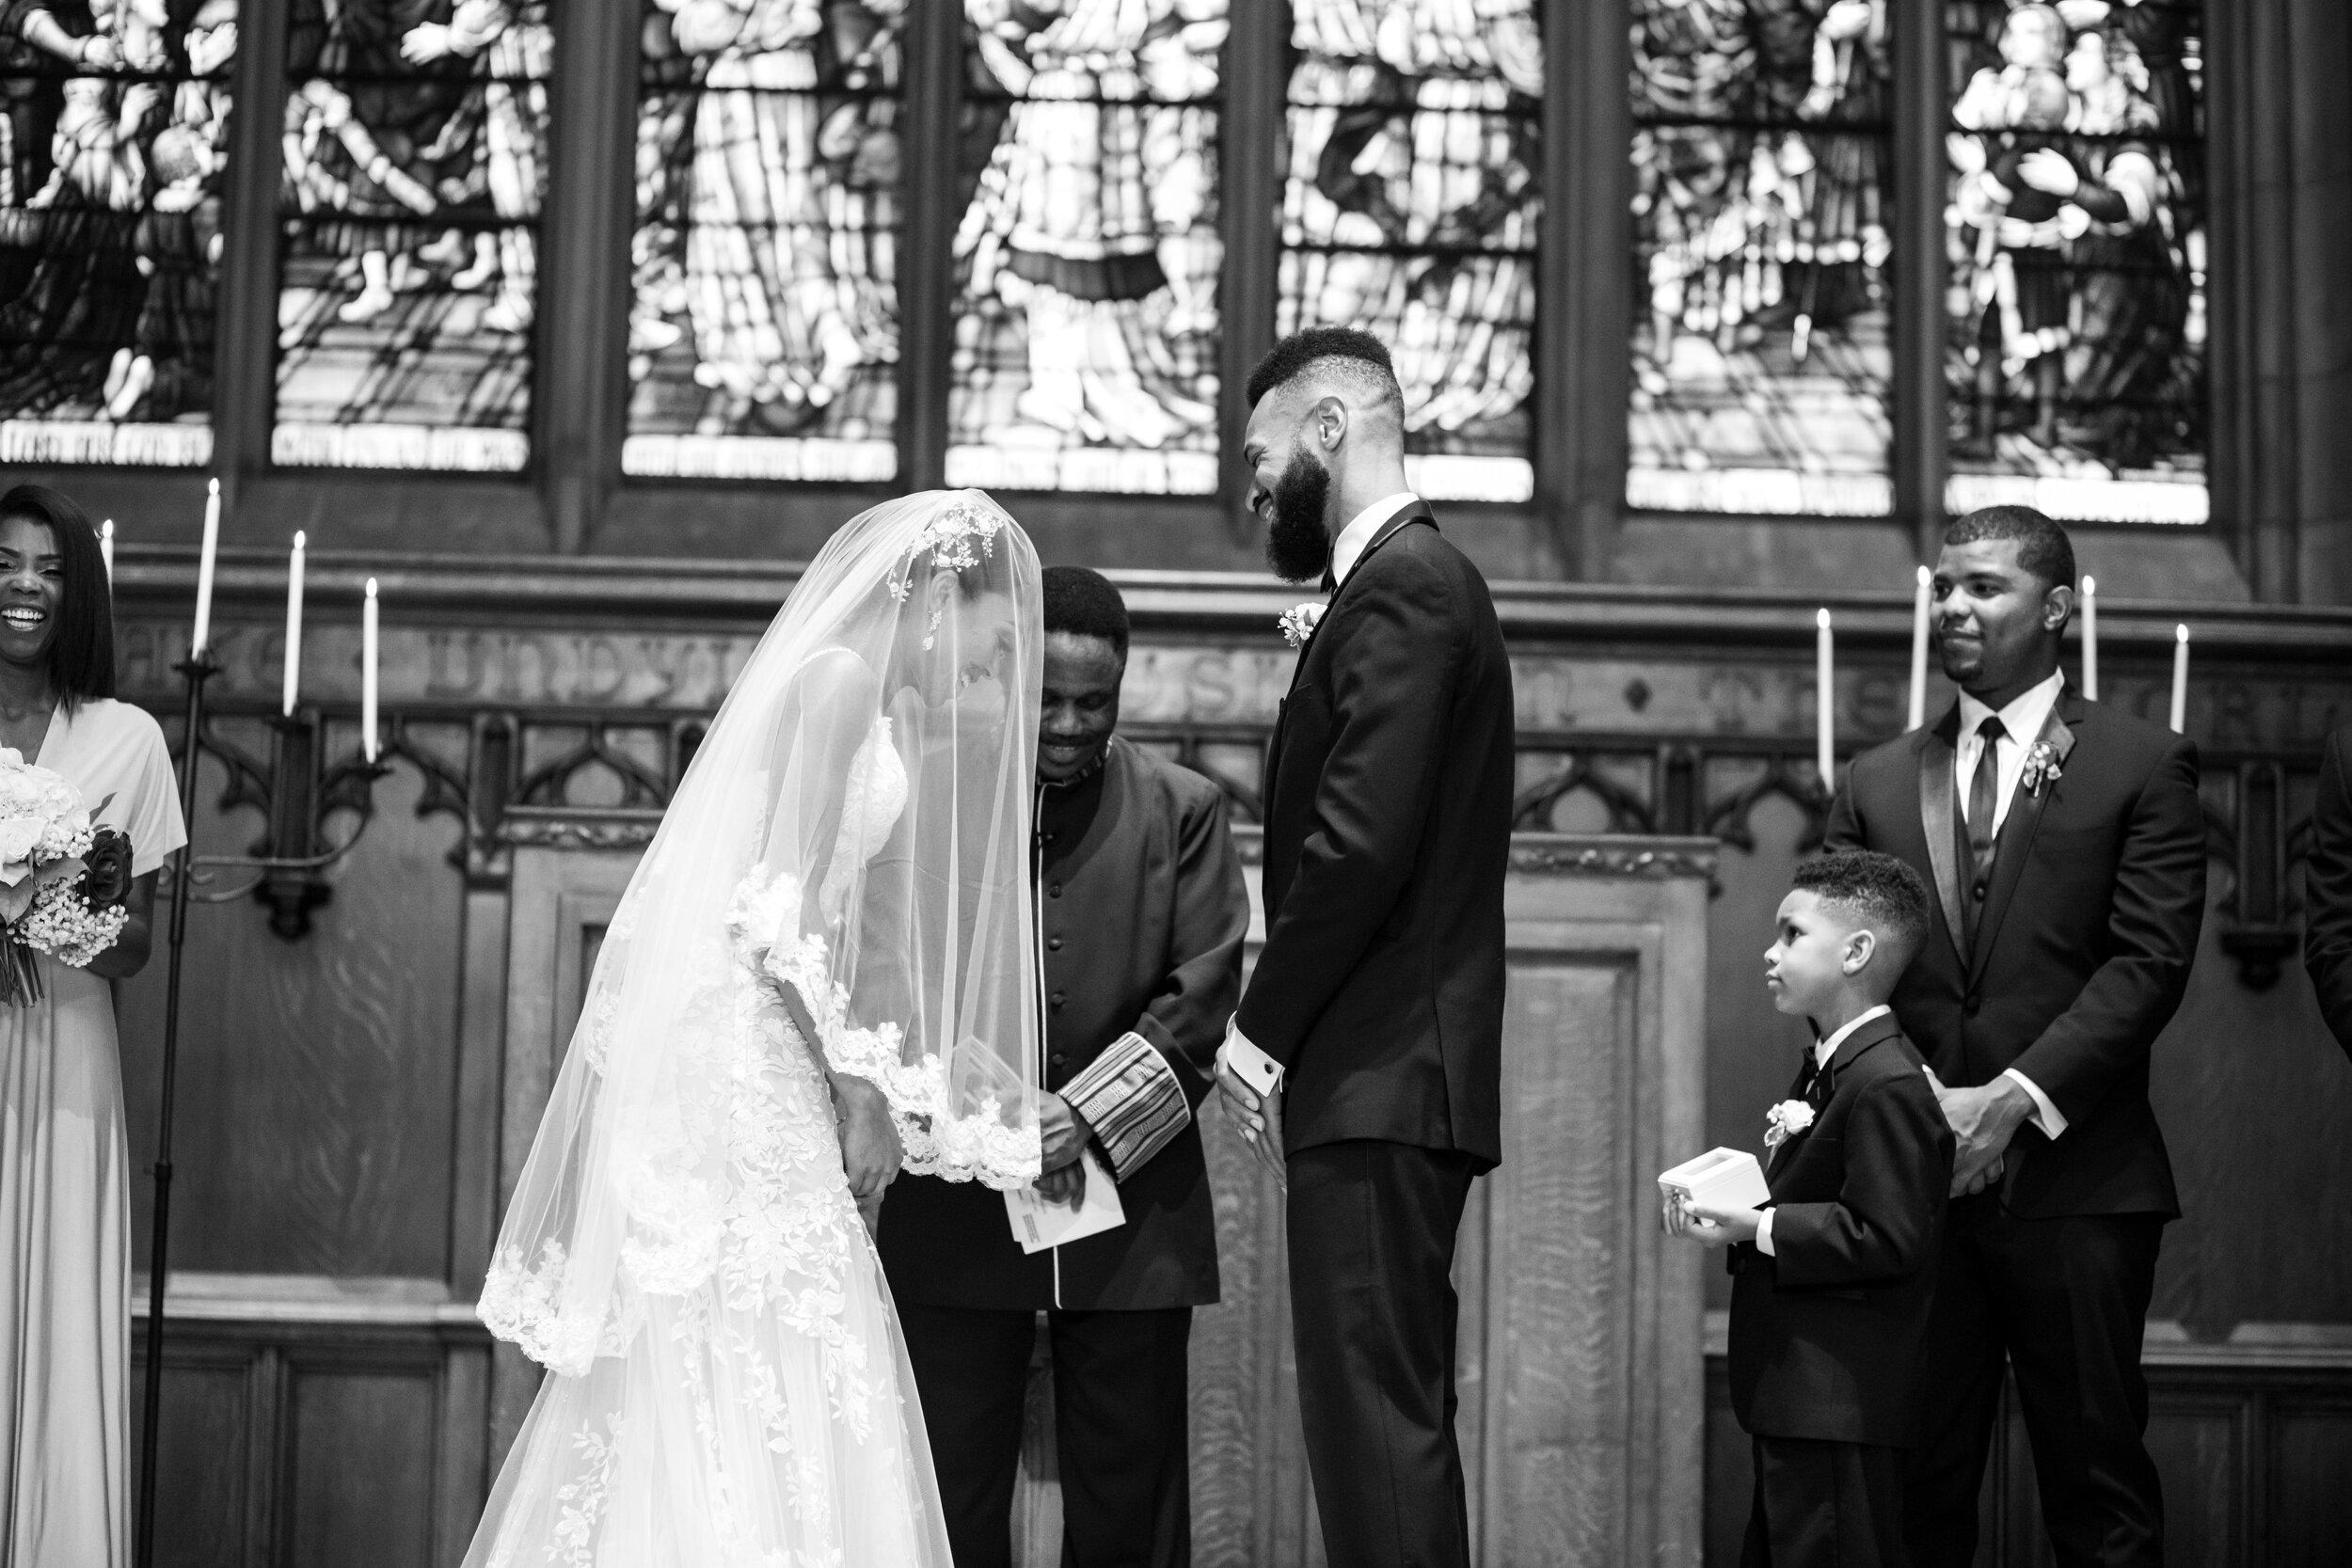 8_3_2019_BONTY_WEDDING-358.jpg